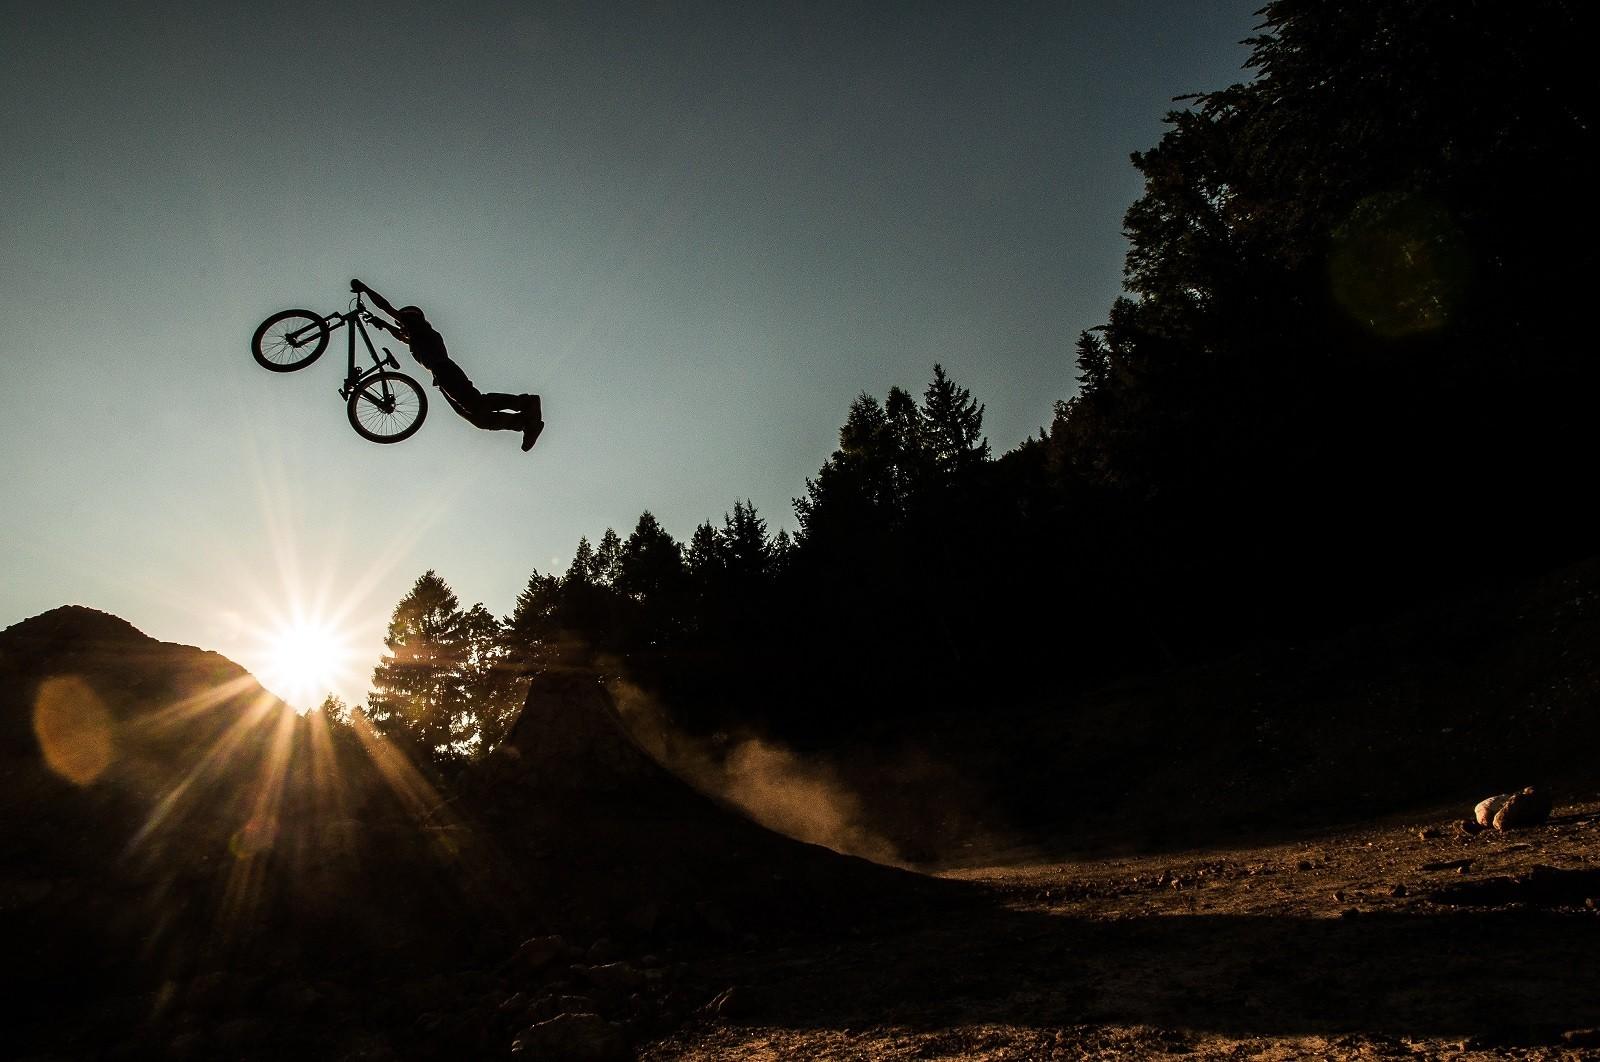 Erik Kralj - lukepaige - Mountain Biking Pictures - Vital MTB